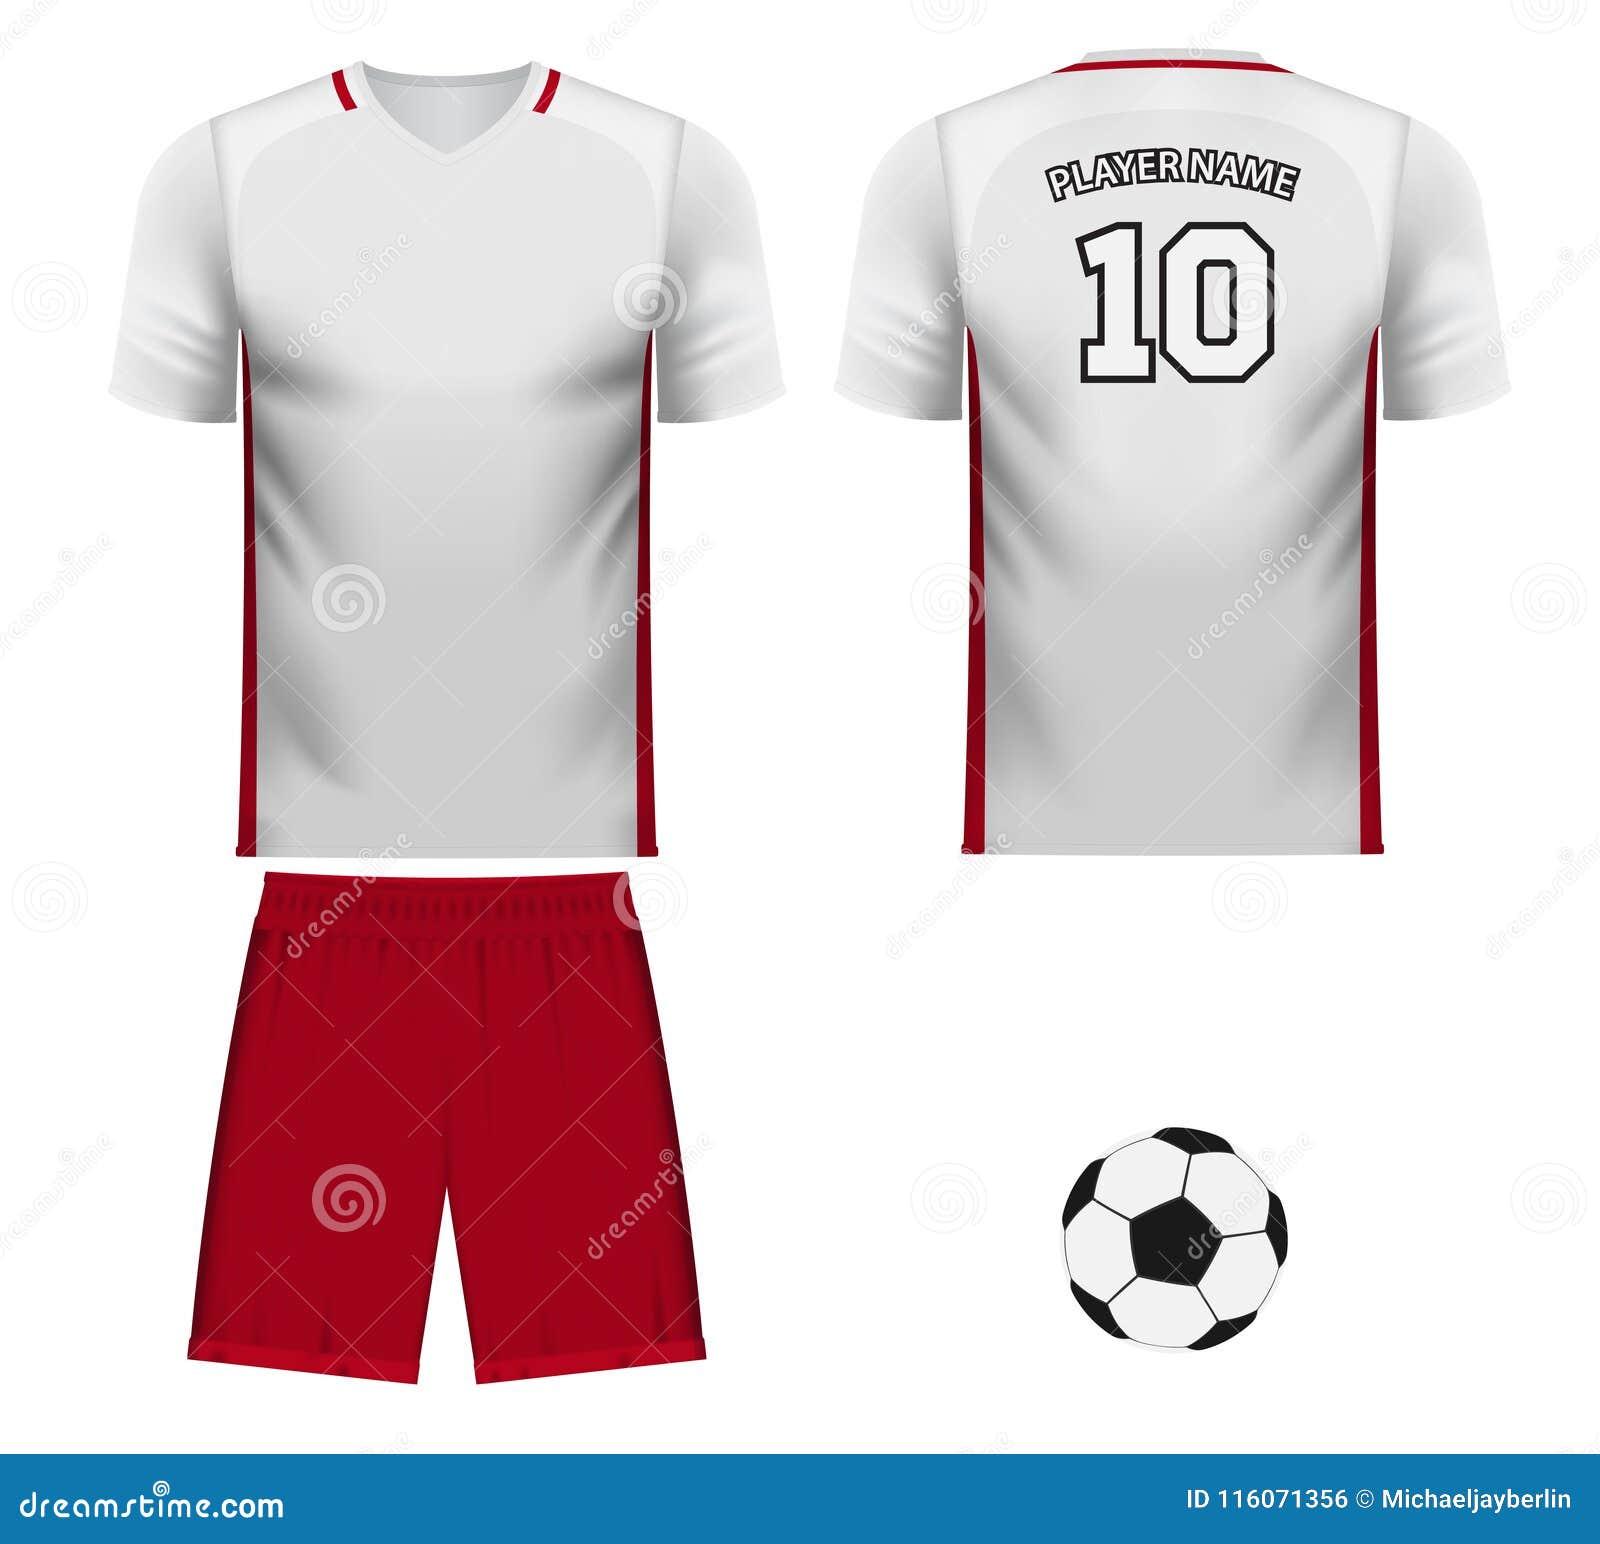 wholesale dealer f57ec 970f5 Poland National Team Jersey Fan Apparel Stock Illustration ...